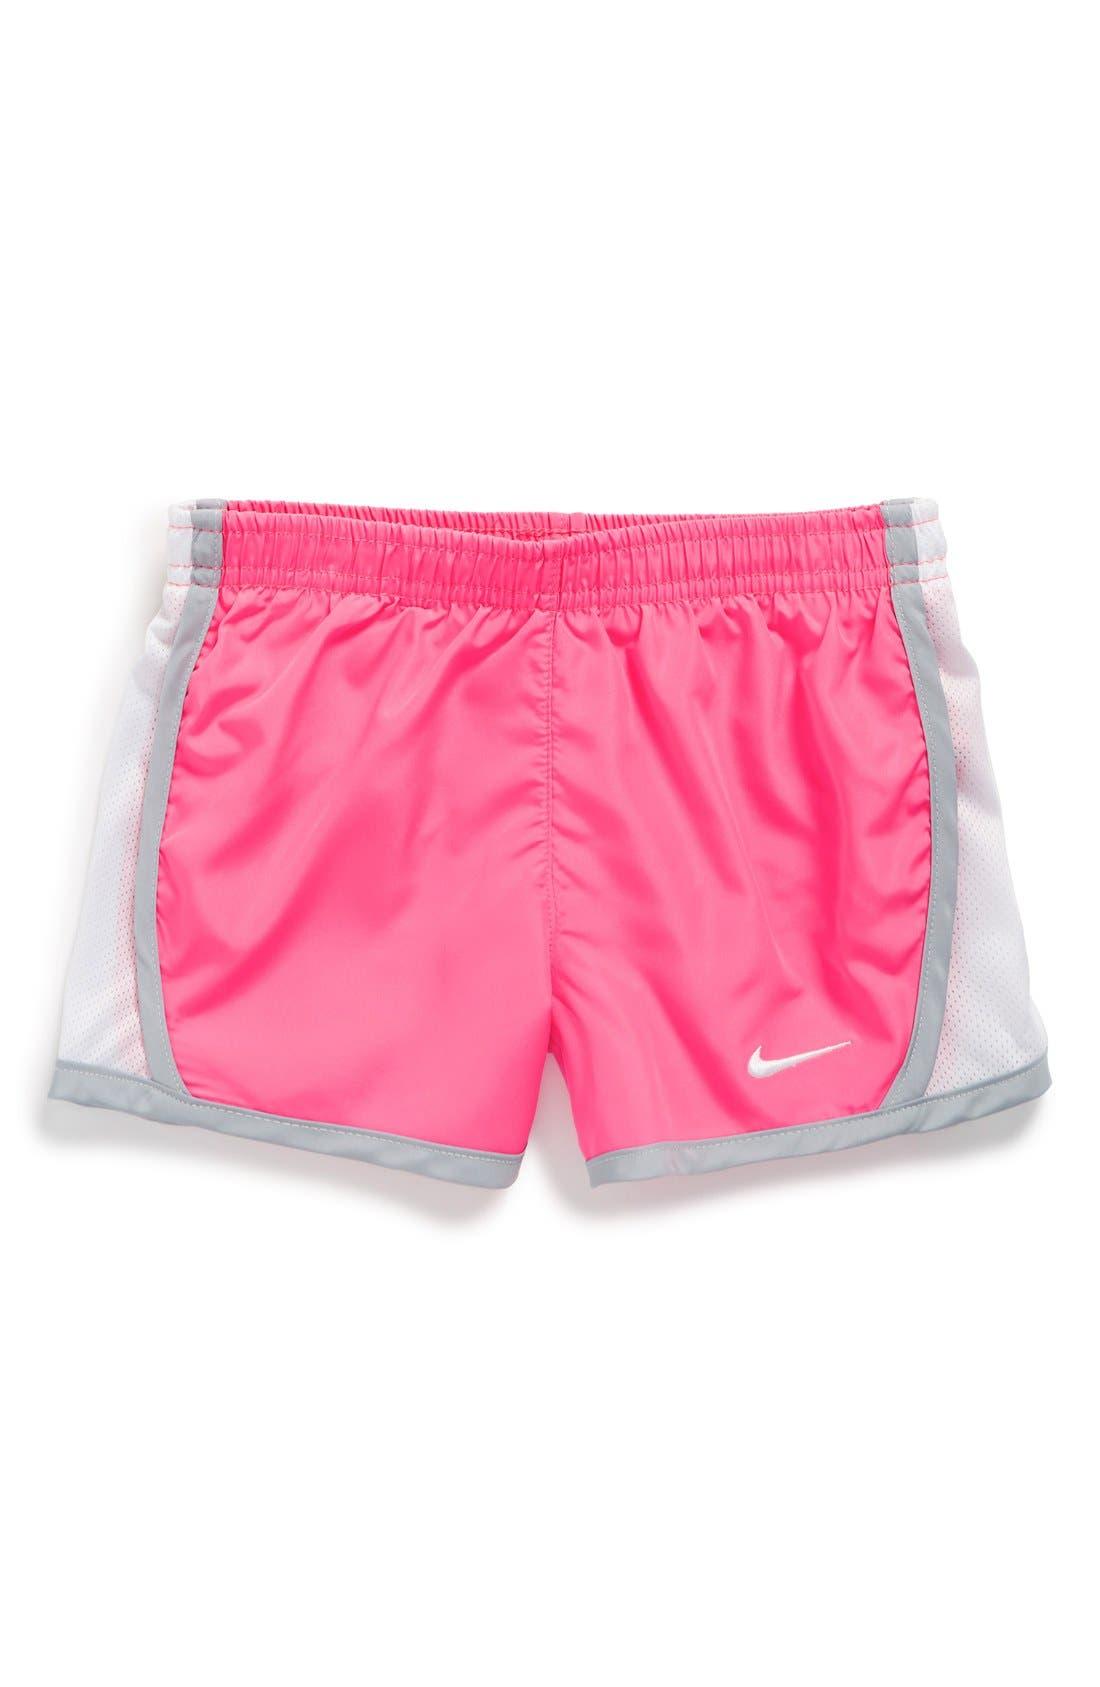 Tempo Dri-FIT Shorts,                         Main,                         color, Pink Pow